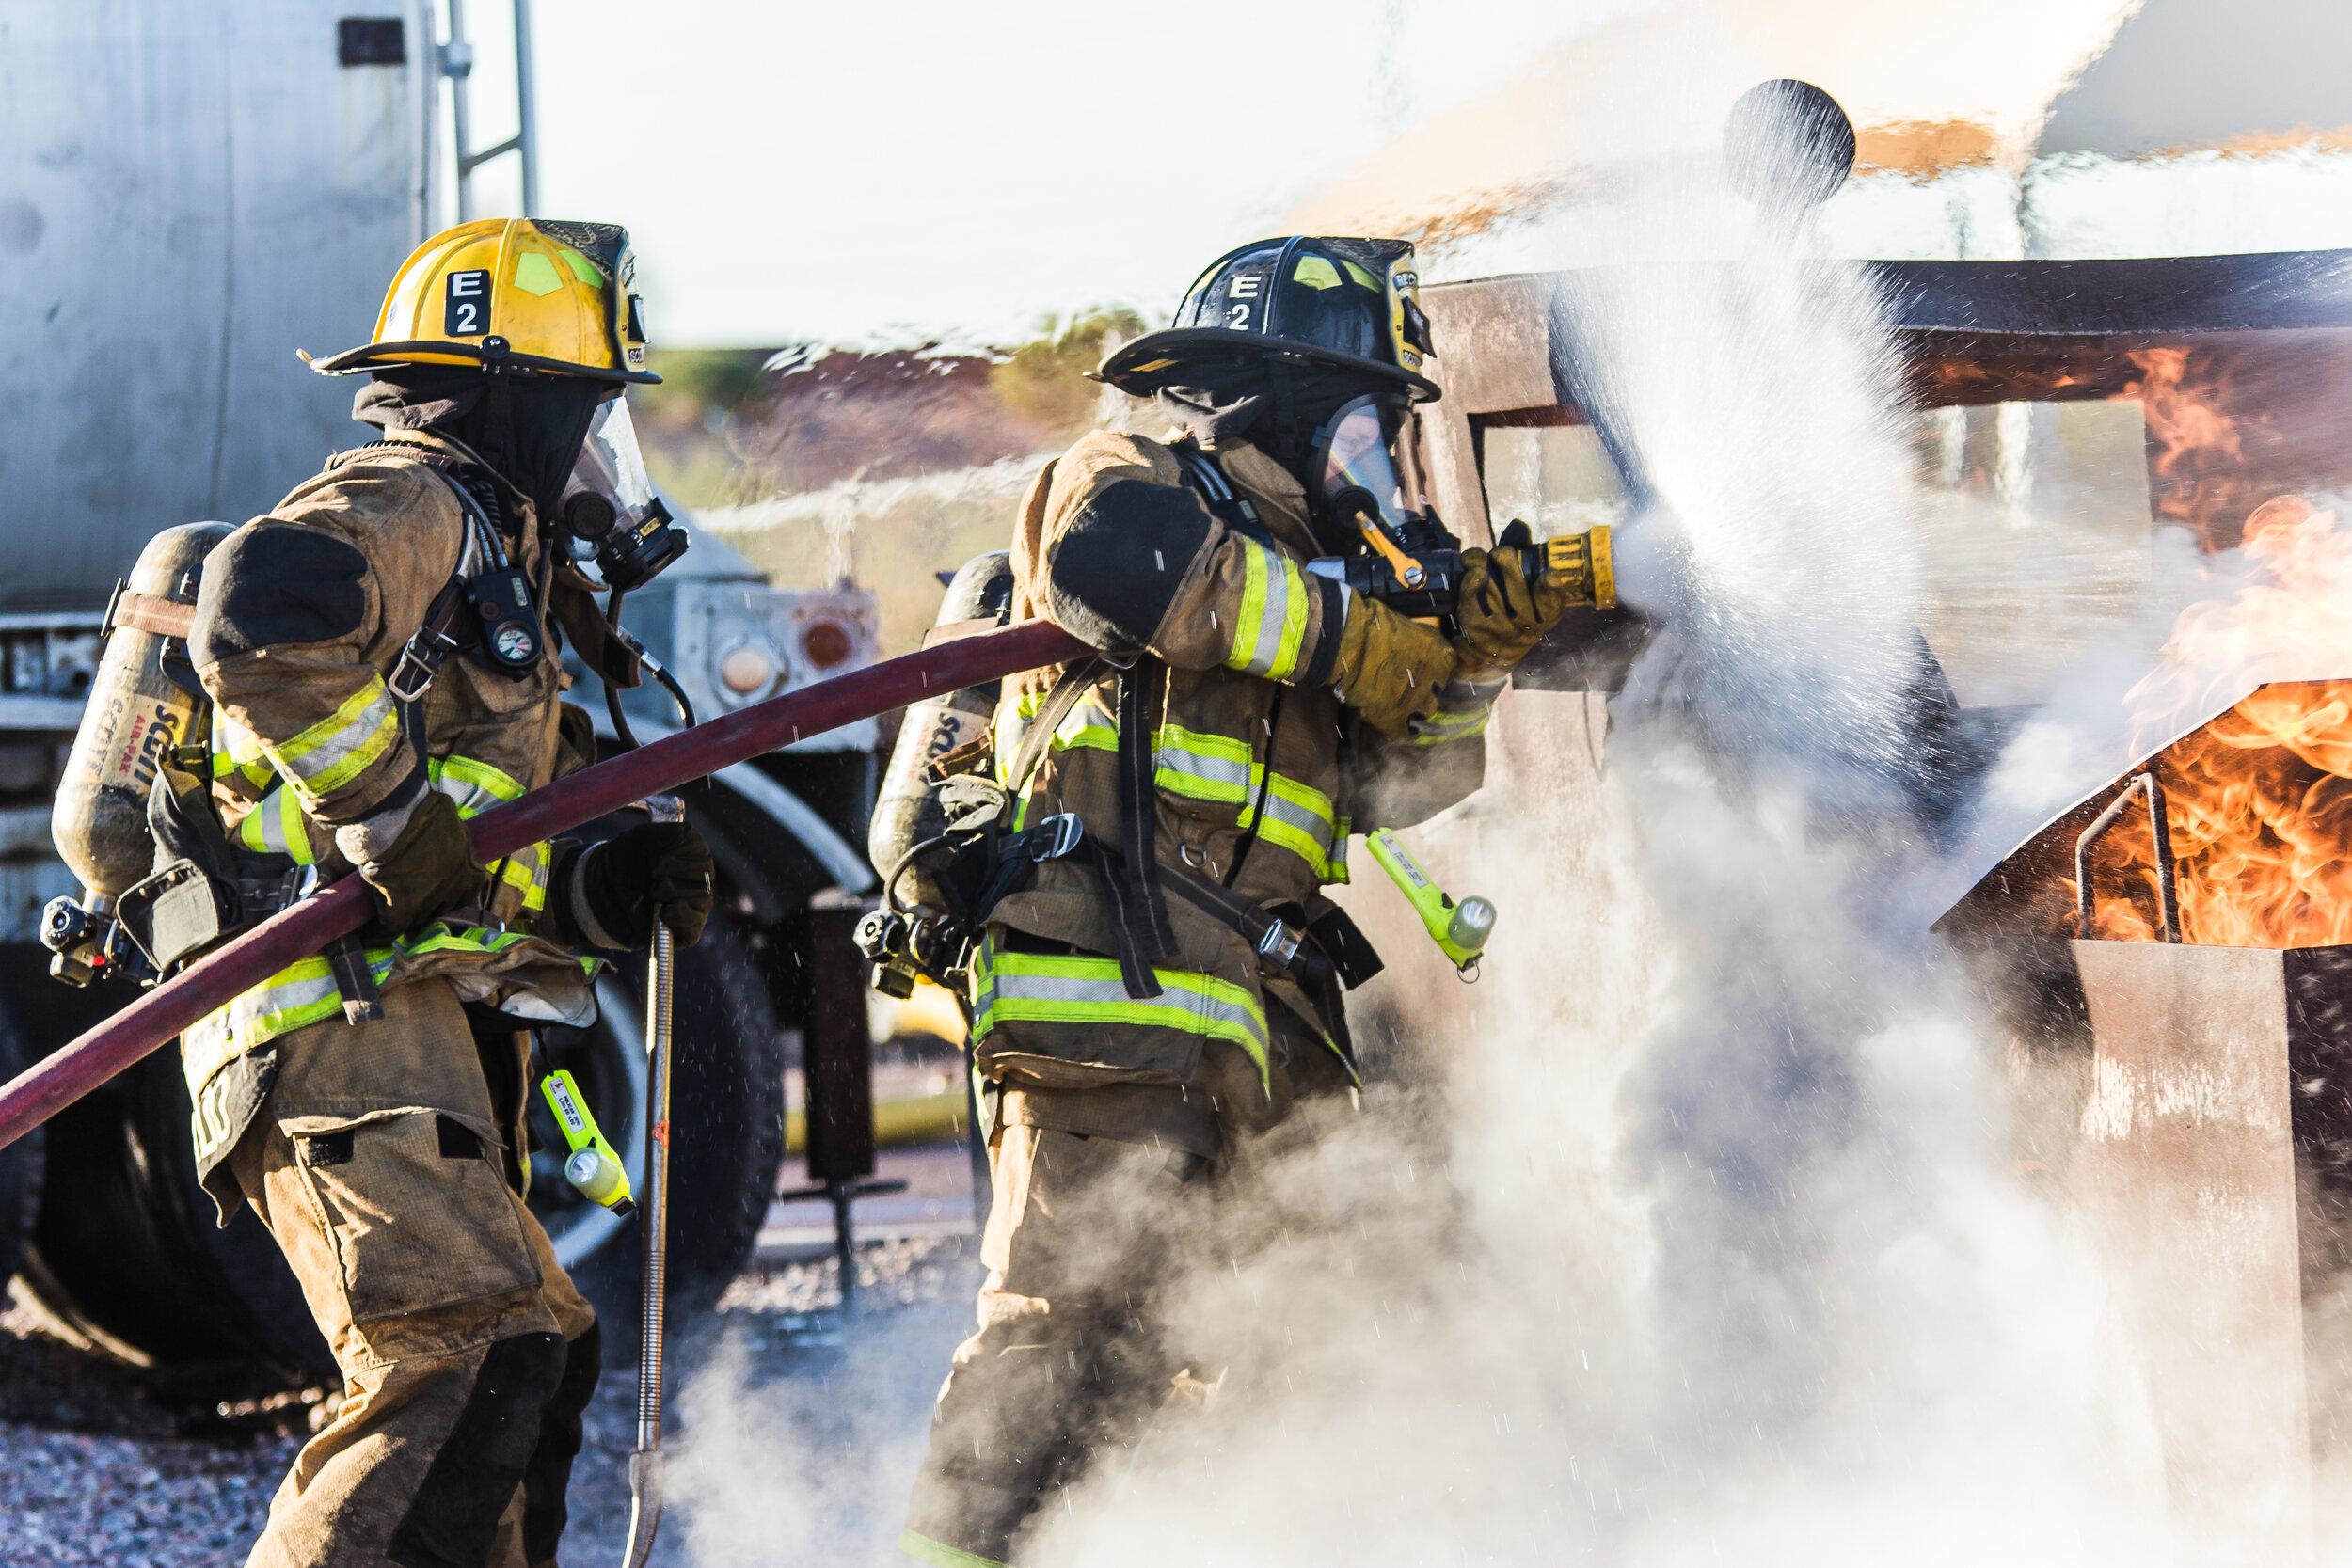 STCW Fire fighting